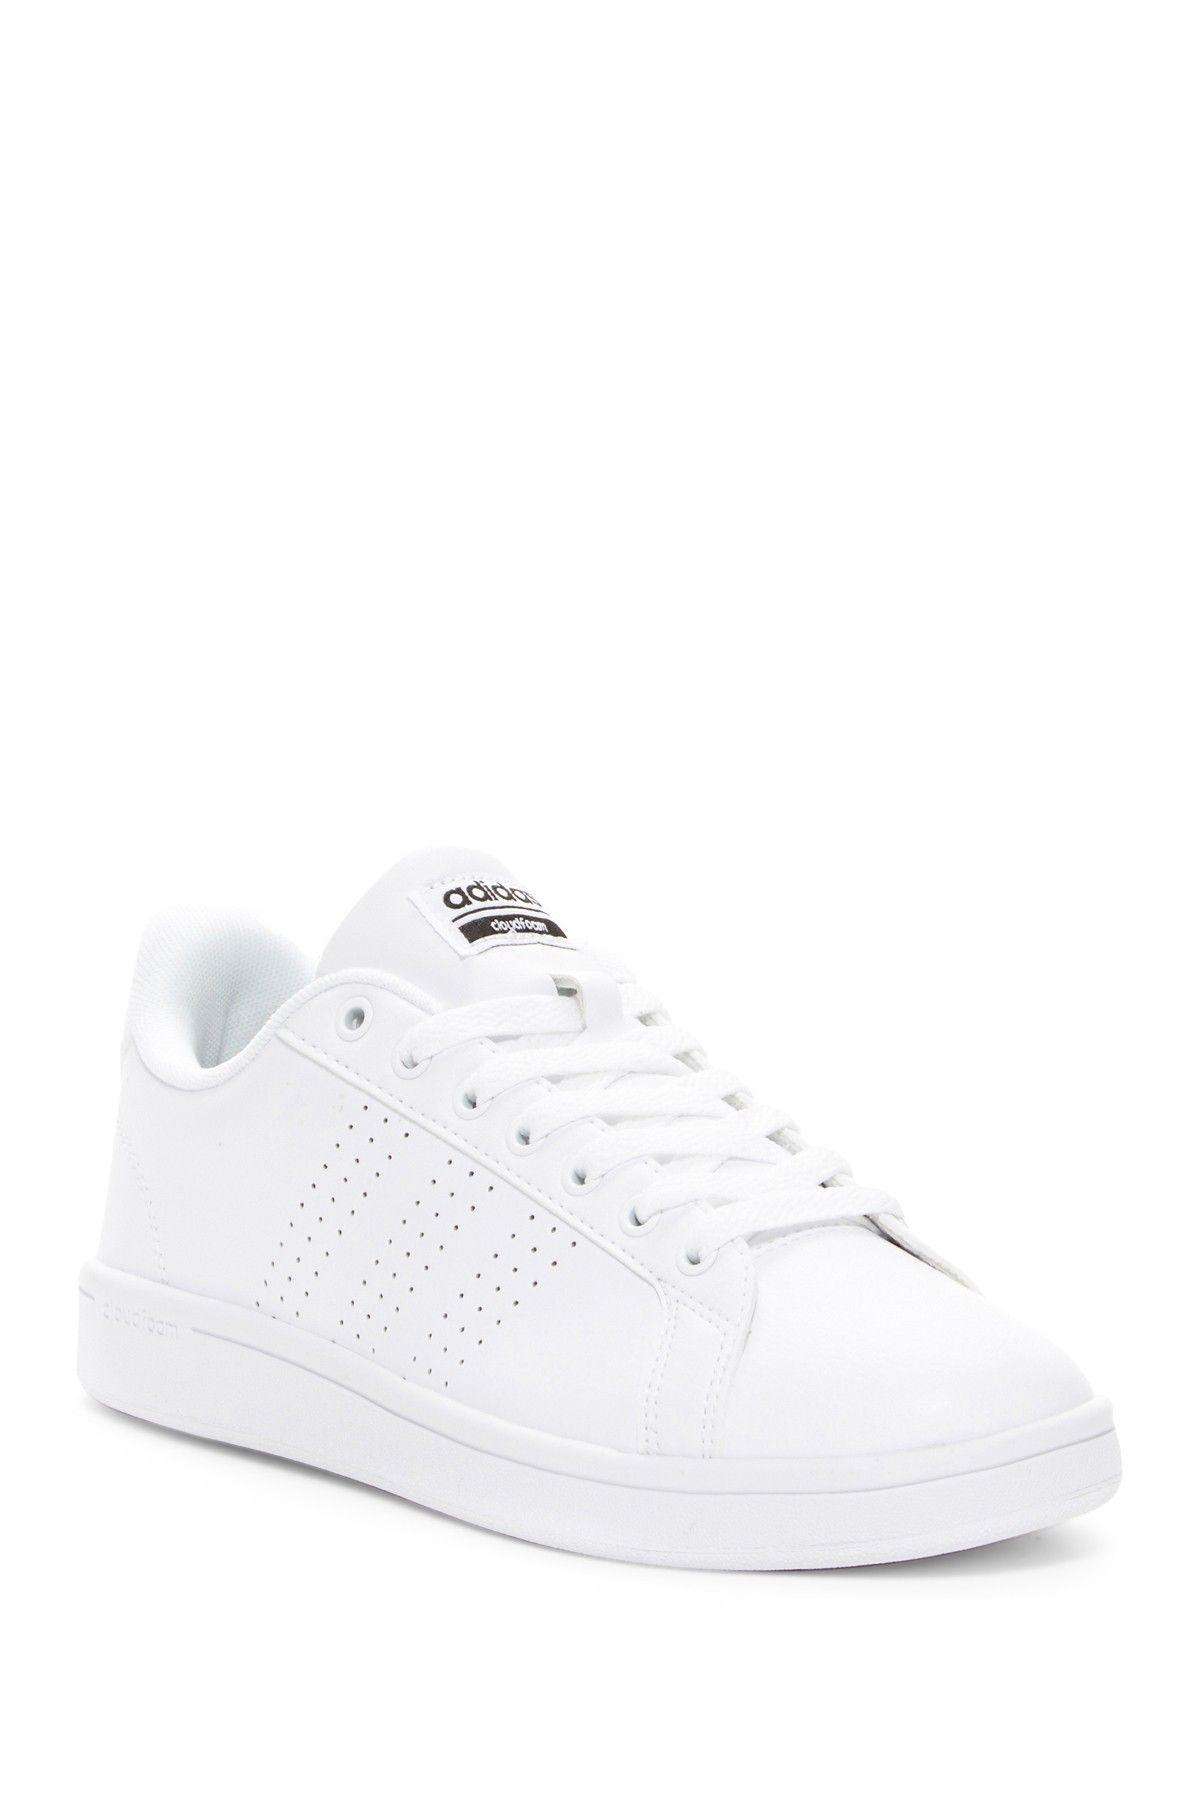 adidas | Cloudfoam Advantage Sneaker